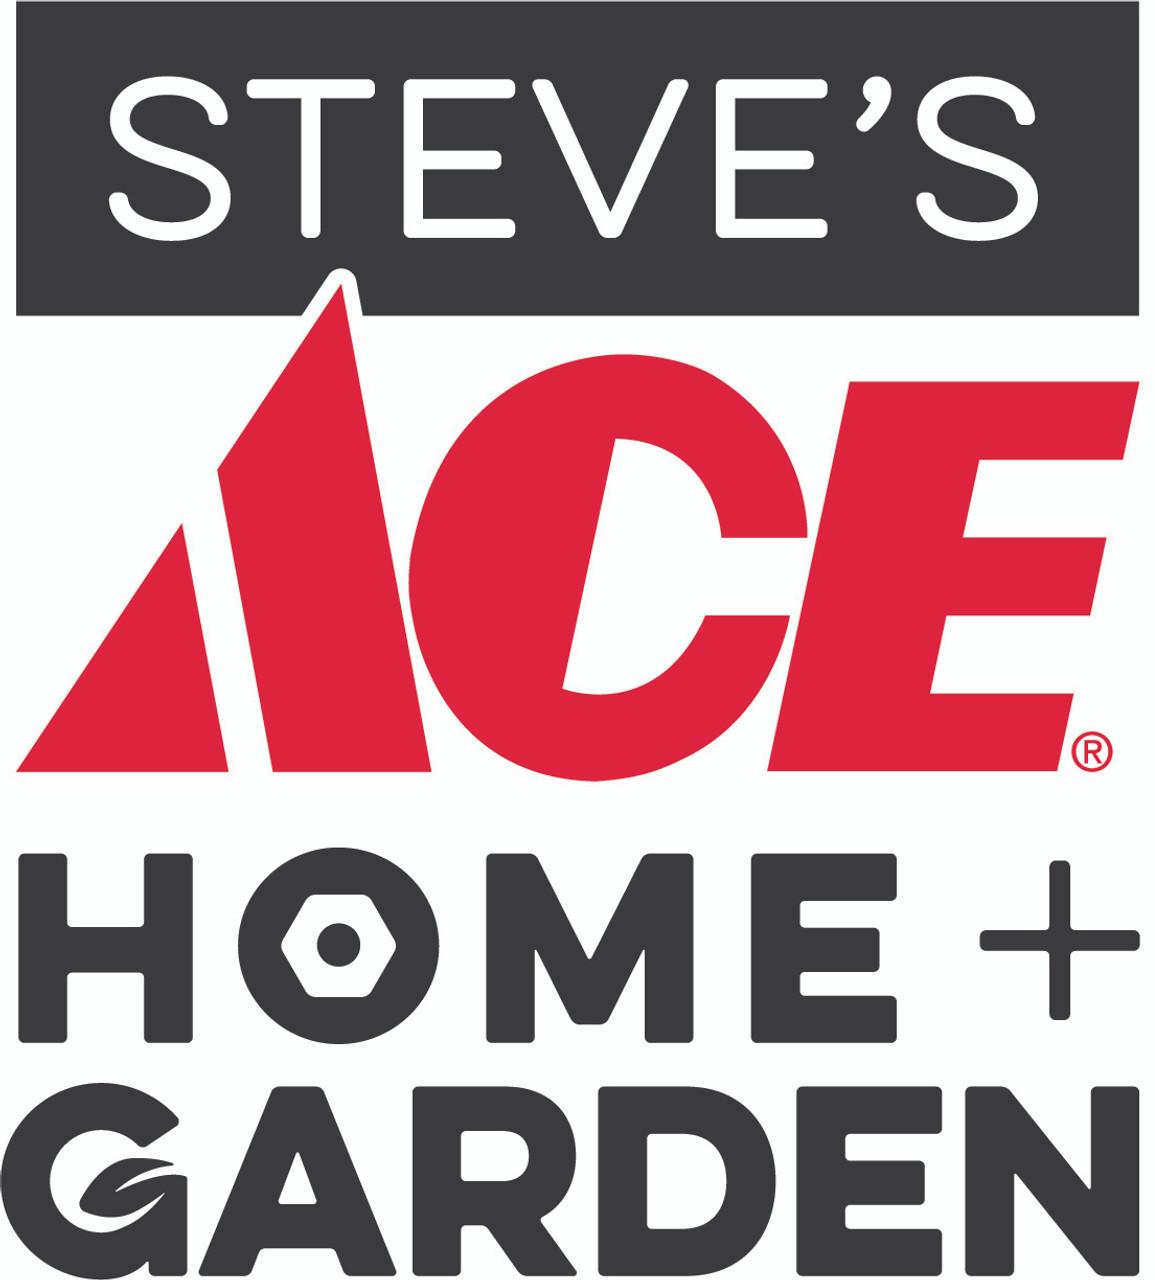 STEVE'S ACE HOME & GARDEN